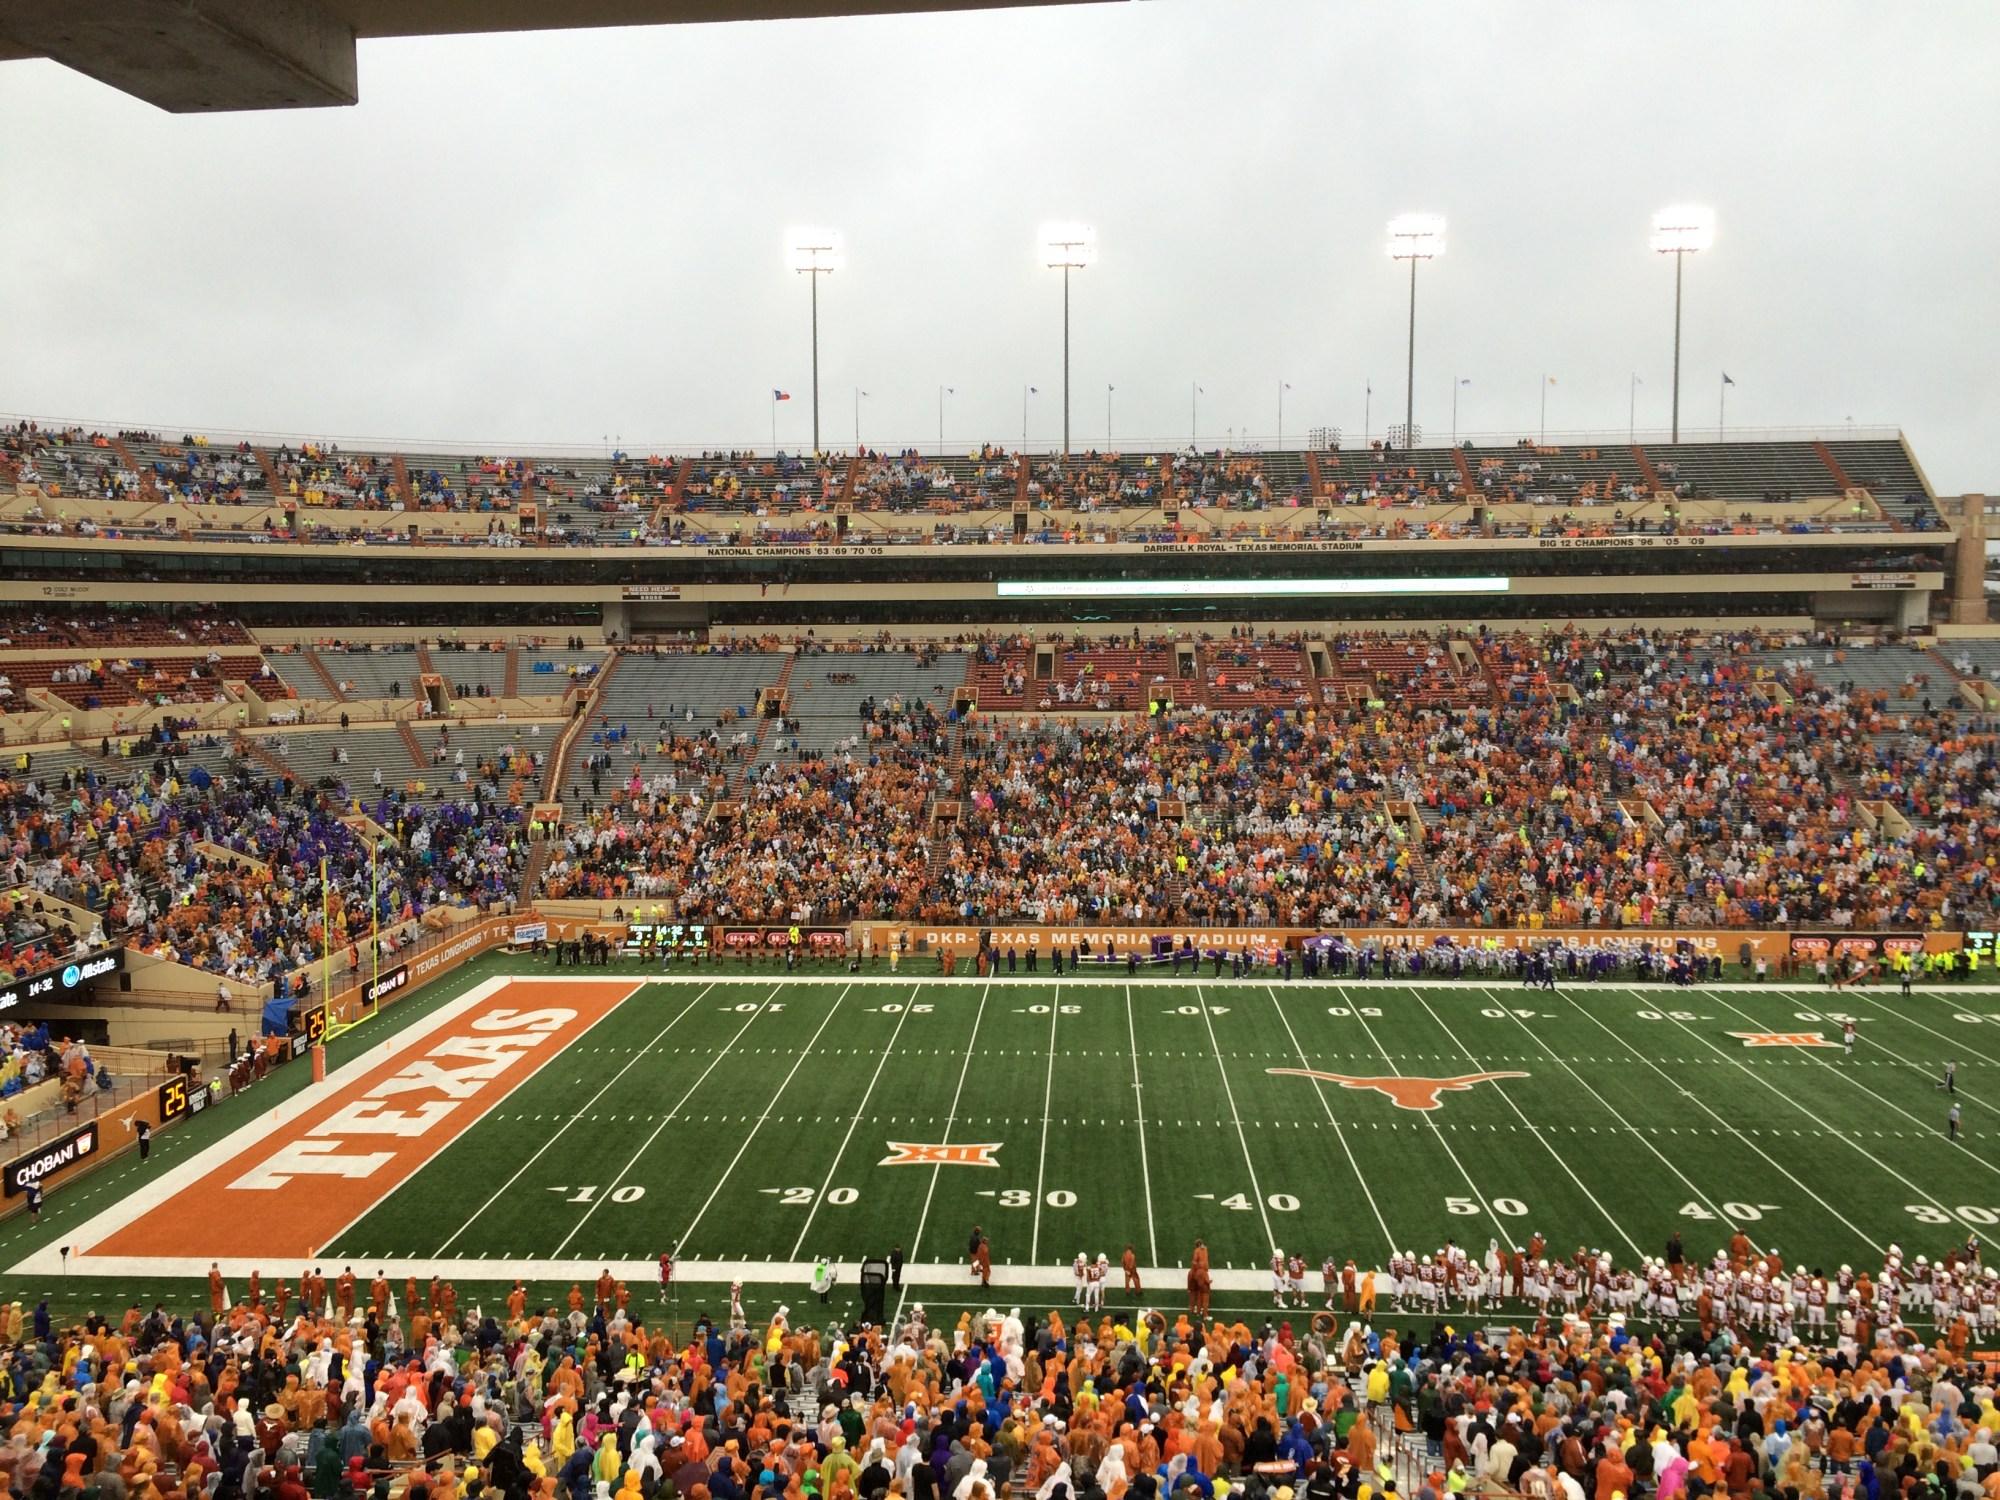 Fans at DKR stadium for Texas_Kansas State game_192069